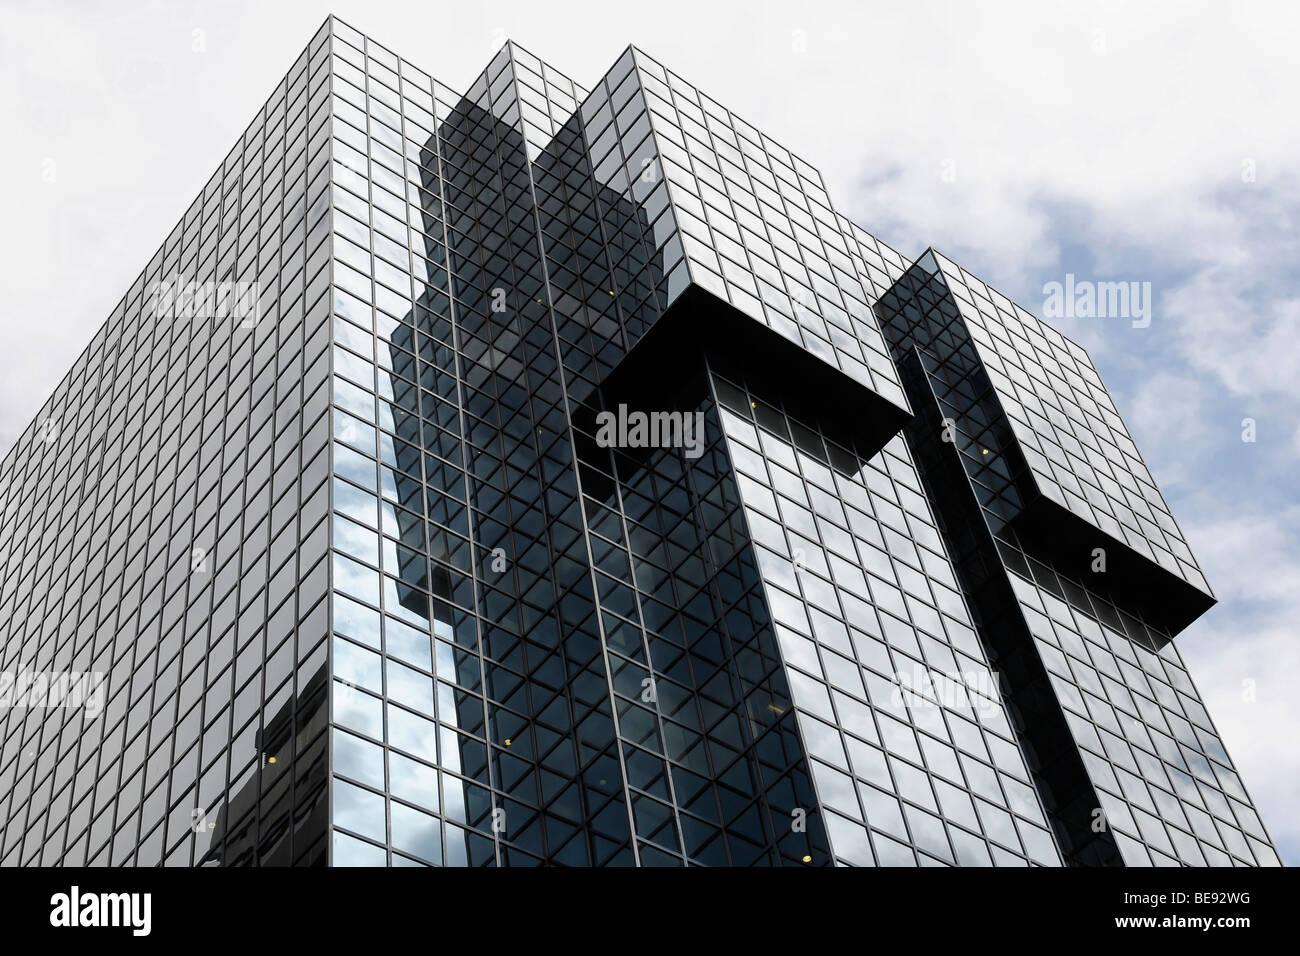 Modern Architecture London England modern architecture, financial district, downtown, london, england